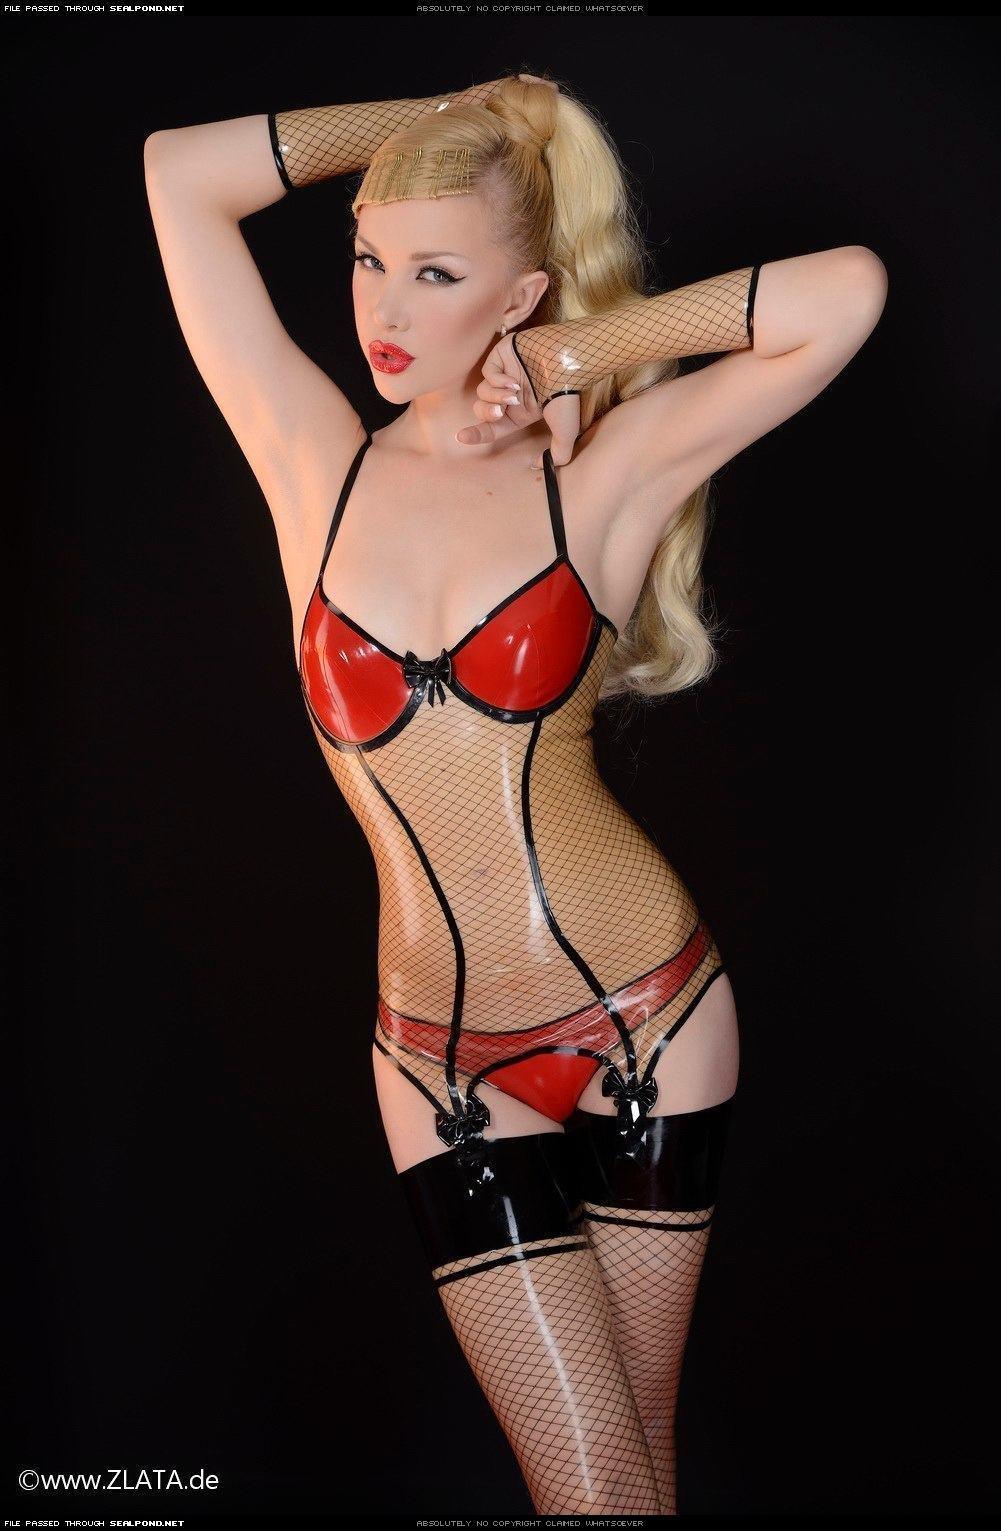 Tits Nude Nazi Women Images